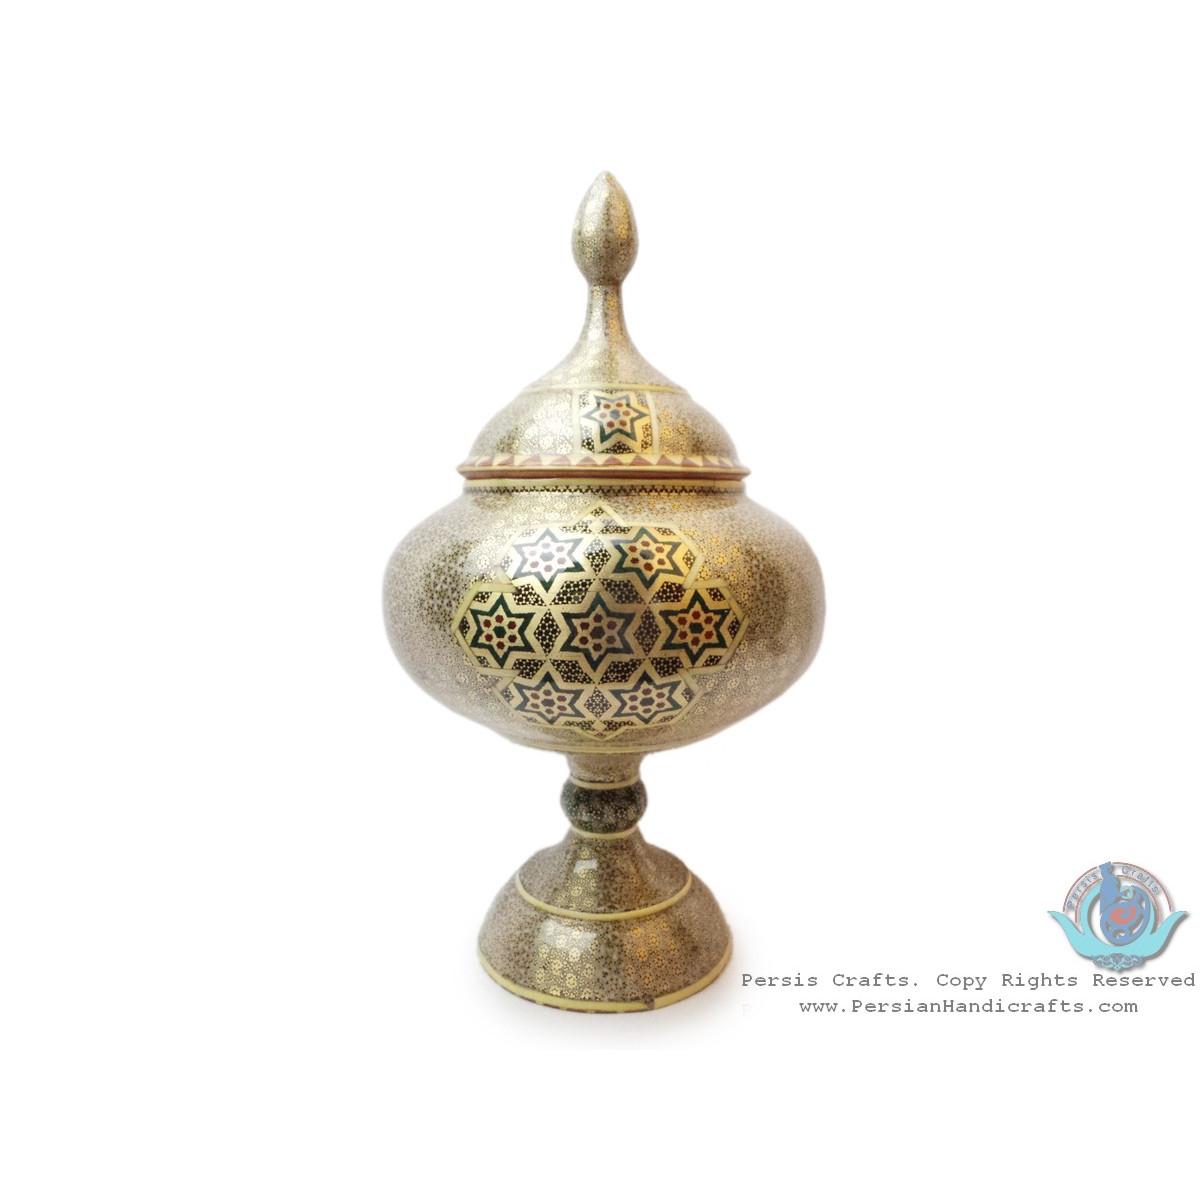 Khatam on Copper Pedestal Bowl Dish - HKH3004-Persian Handicrafts